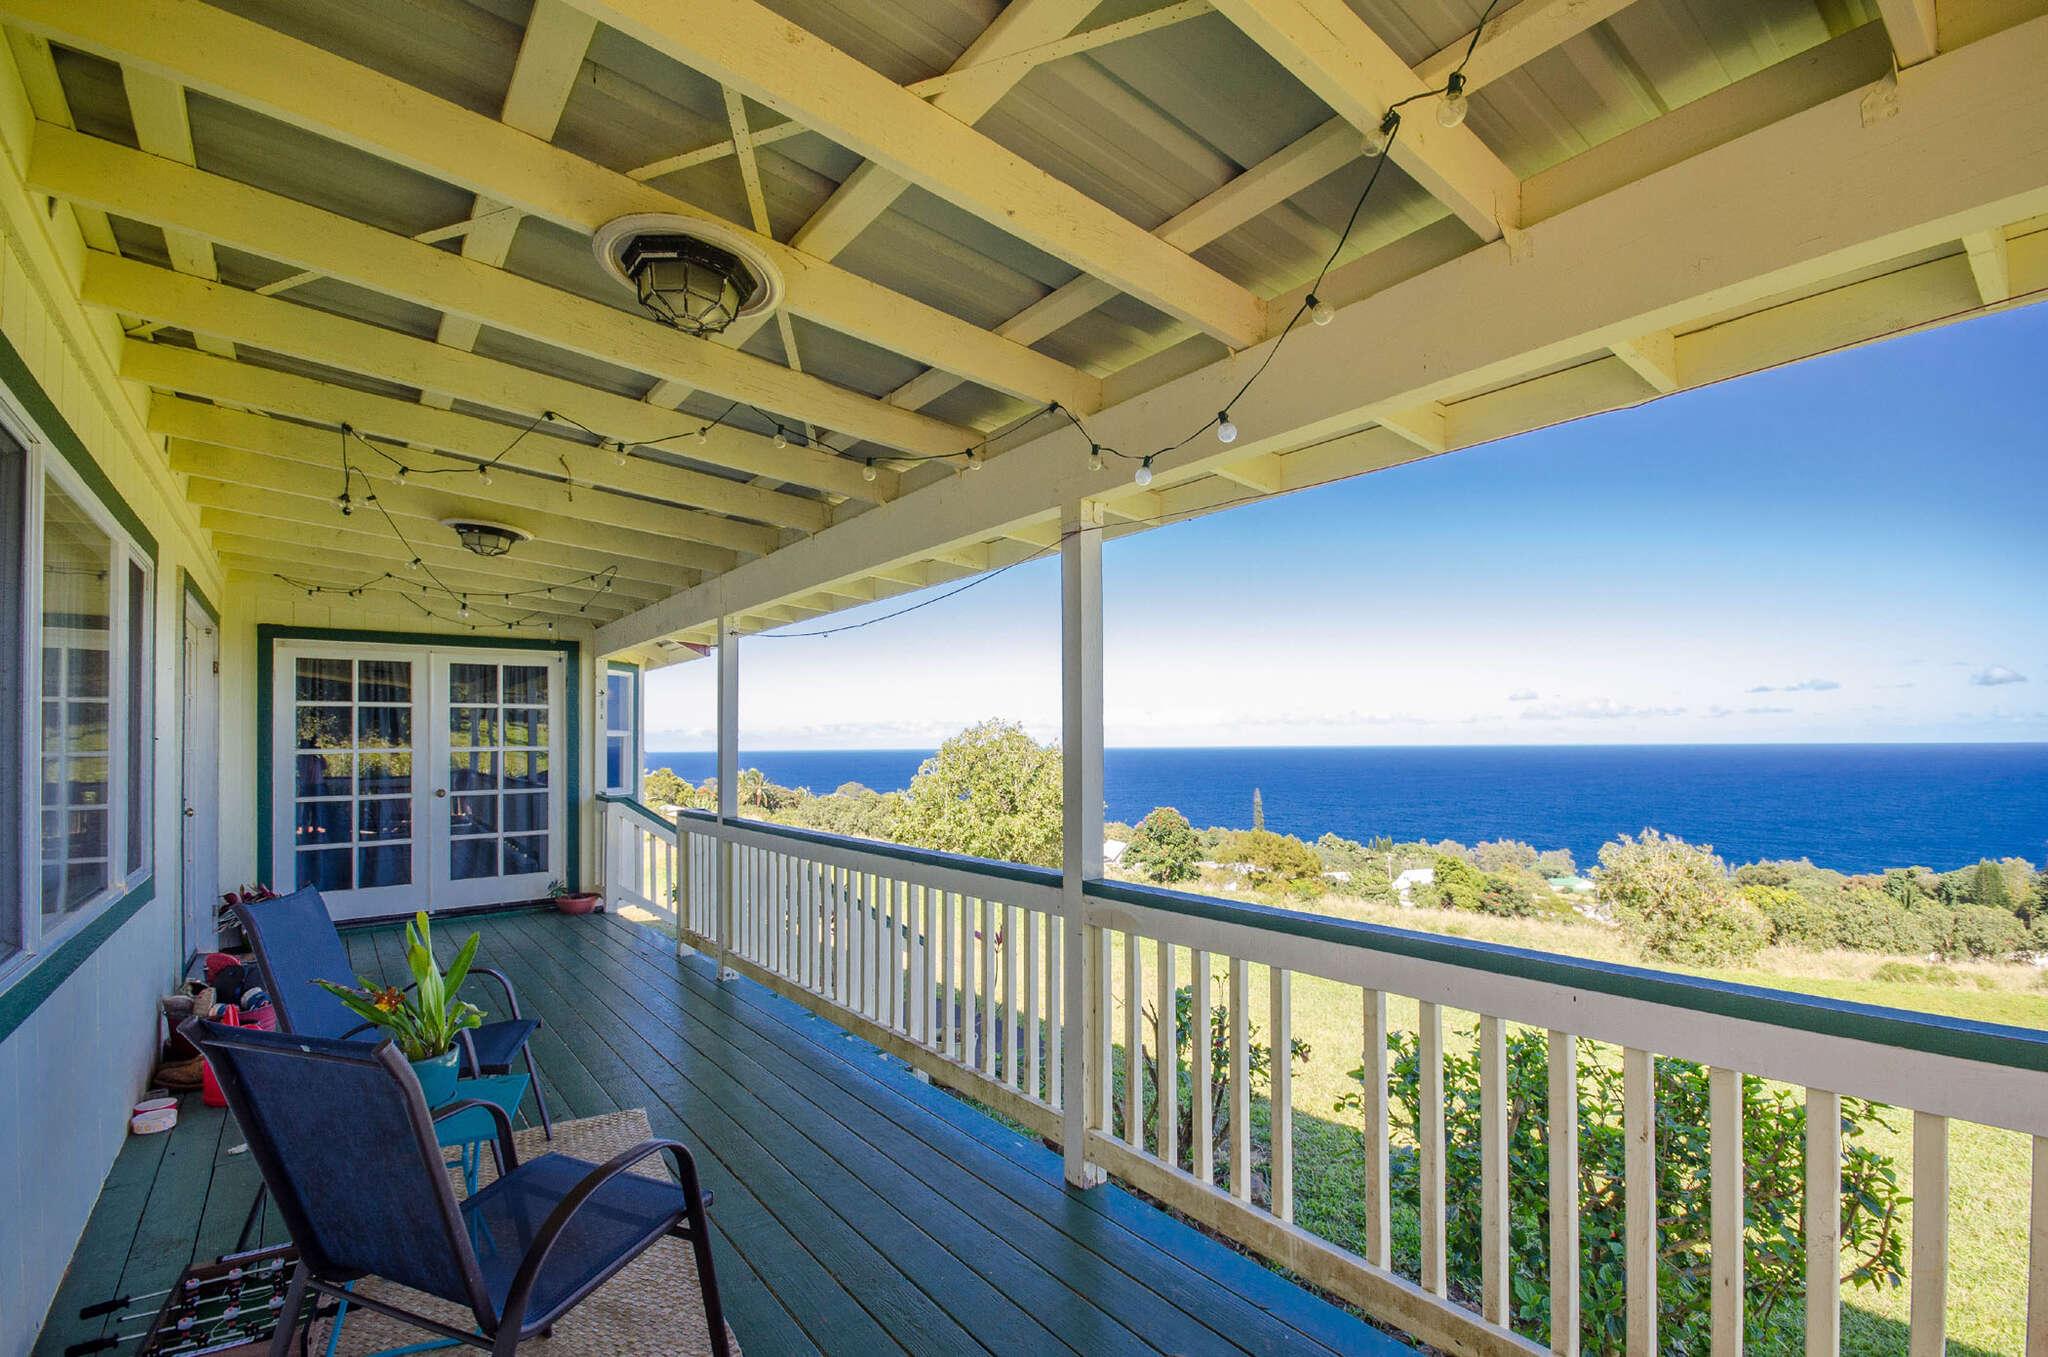 Single Family for Sale at 35-2029 Papaaloa Place Papaaloa, Hawaii 96780 United States